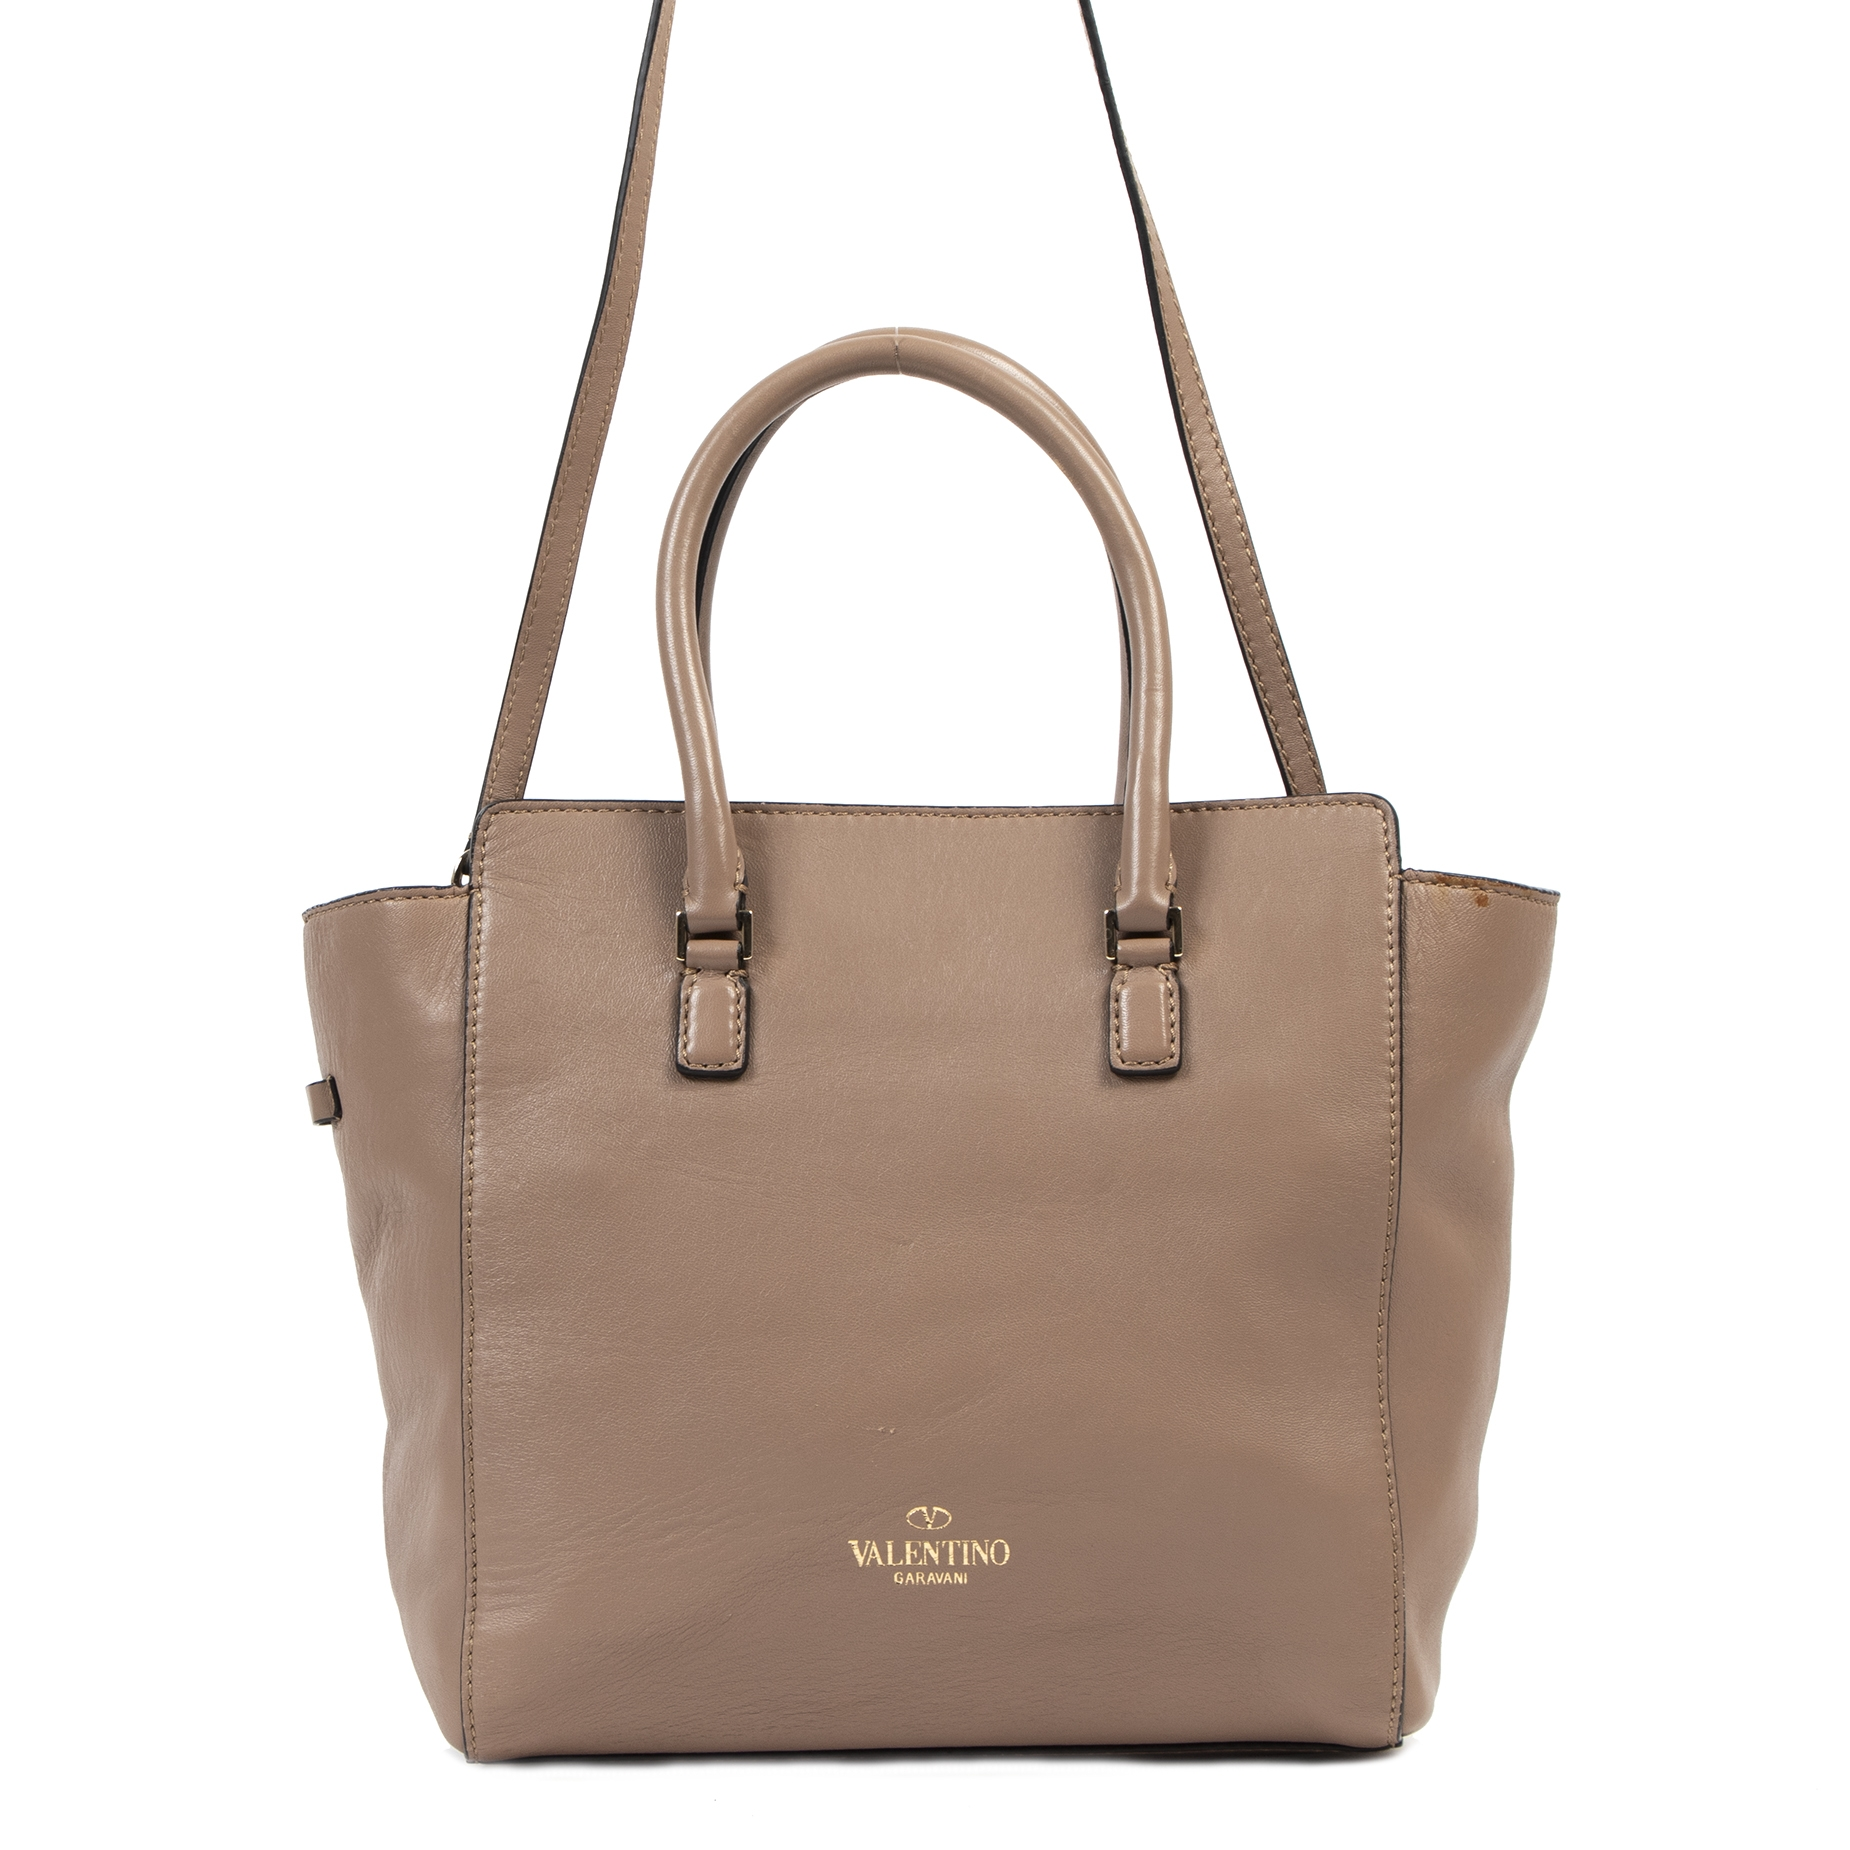 Authentieke tweedehands vintage Valentino Nude Embellished Tote Bag koop online webshop LabelLOV